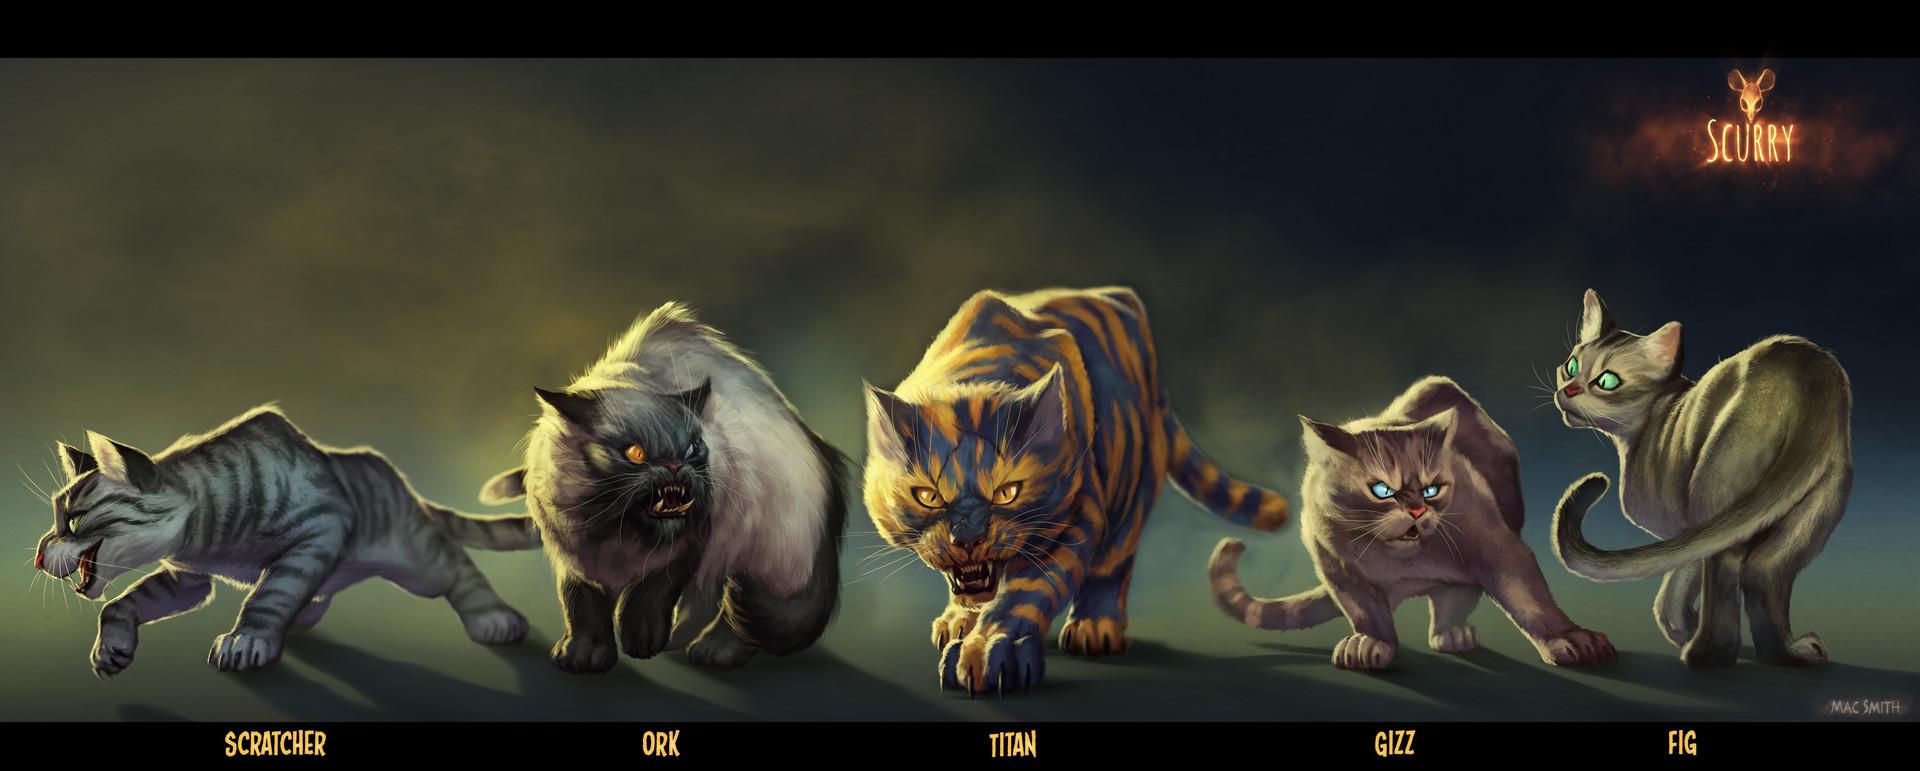 Mac smith cat lineup